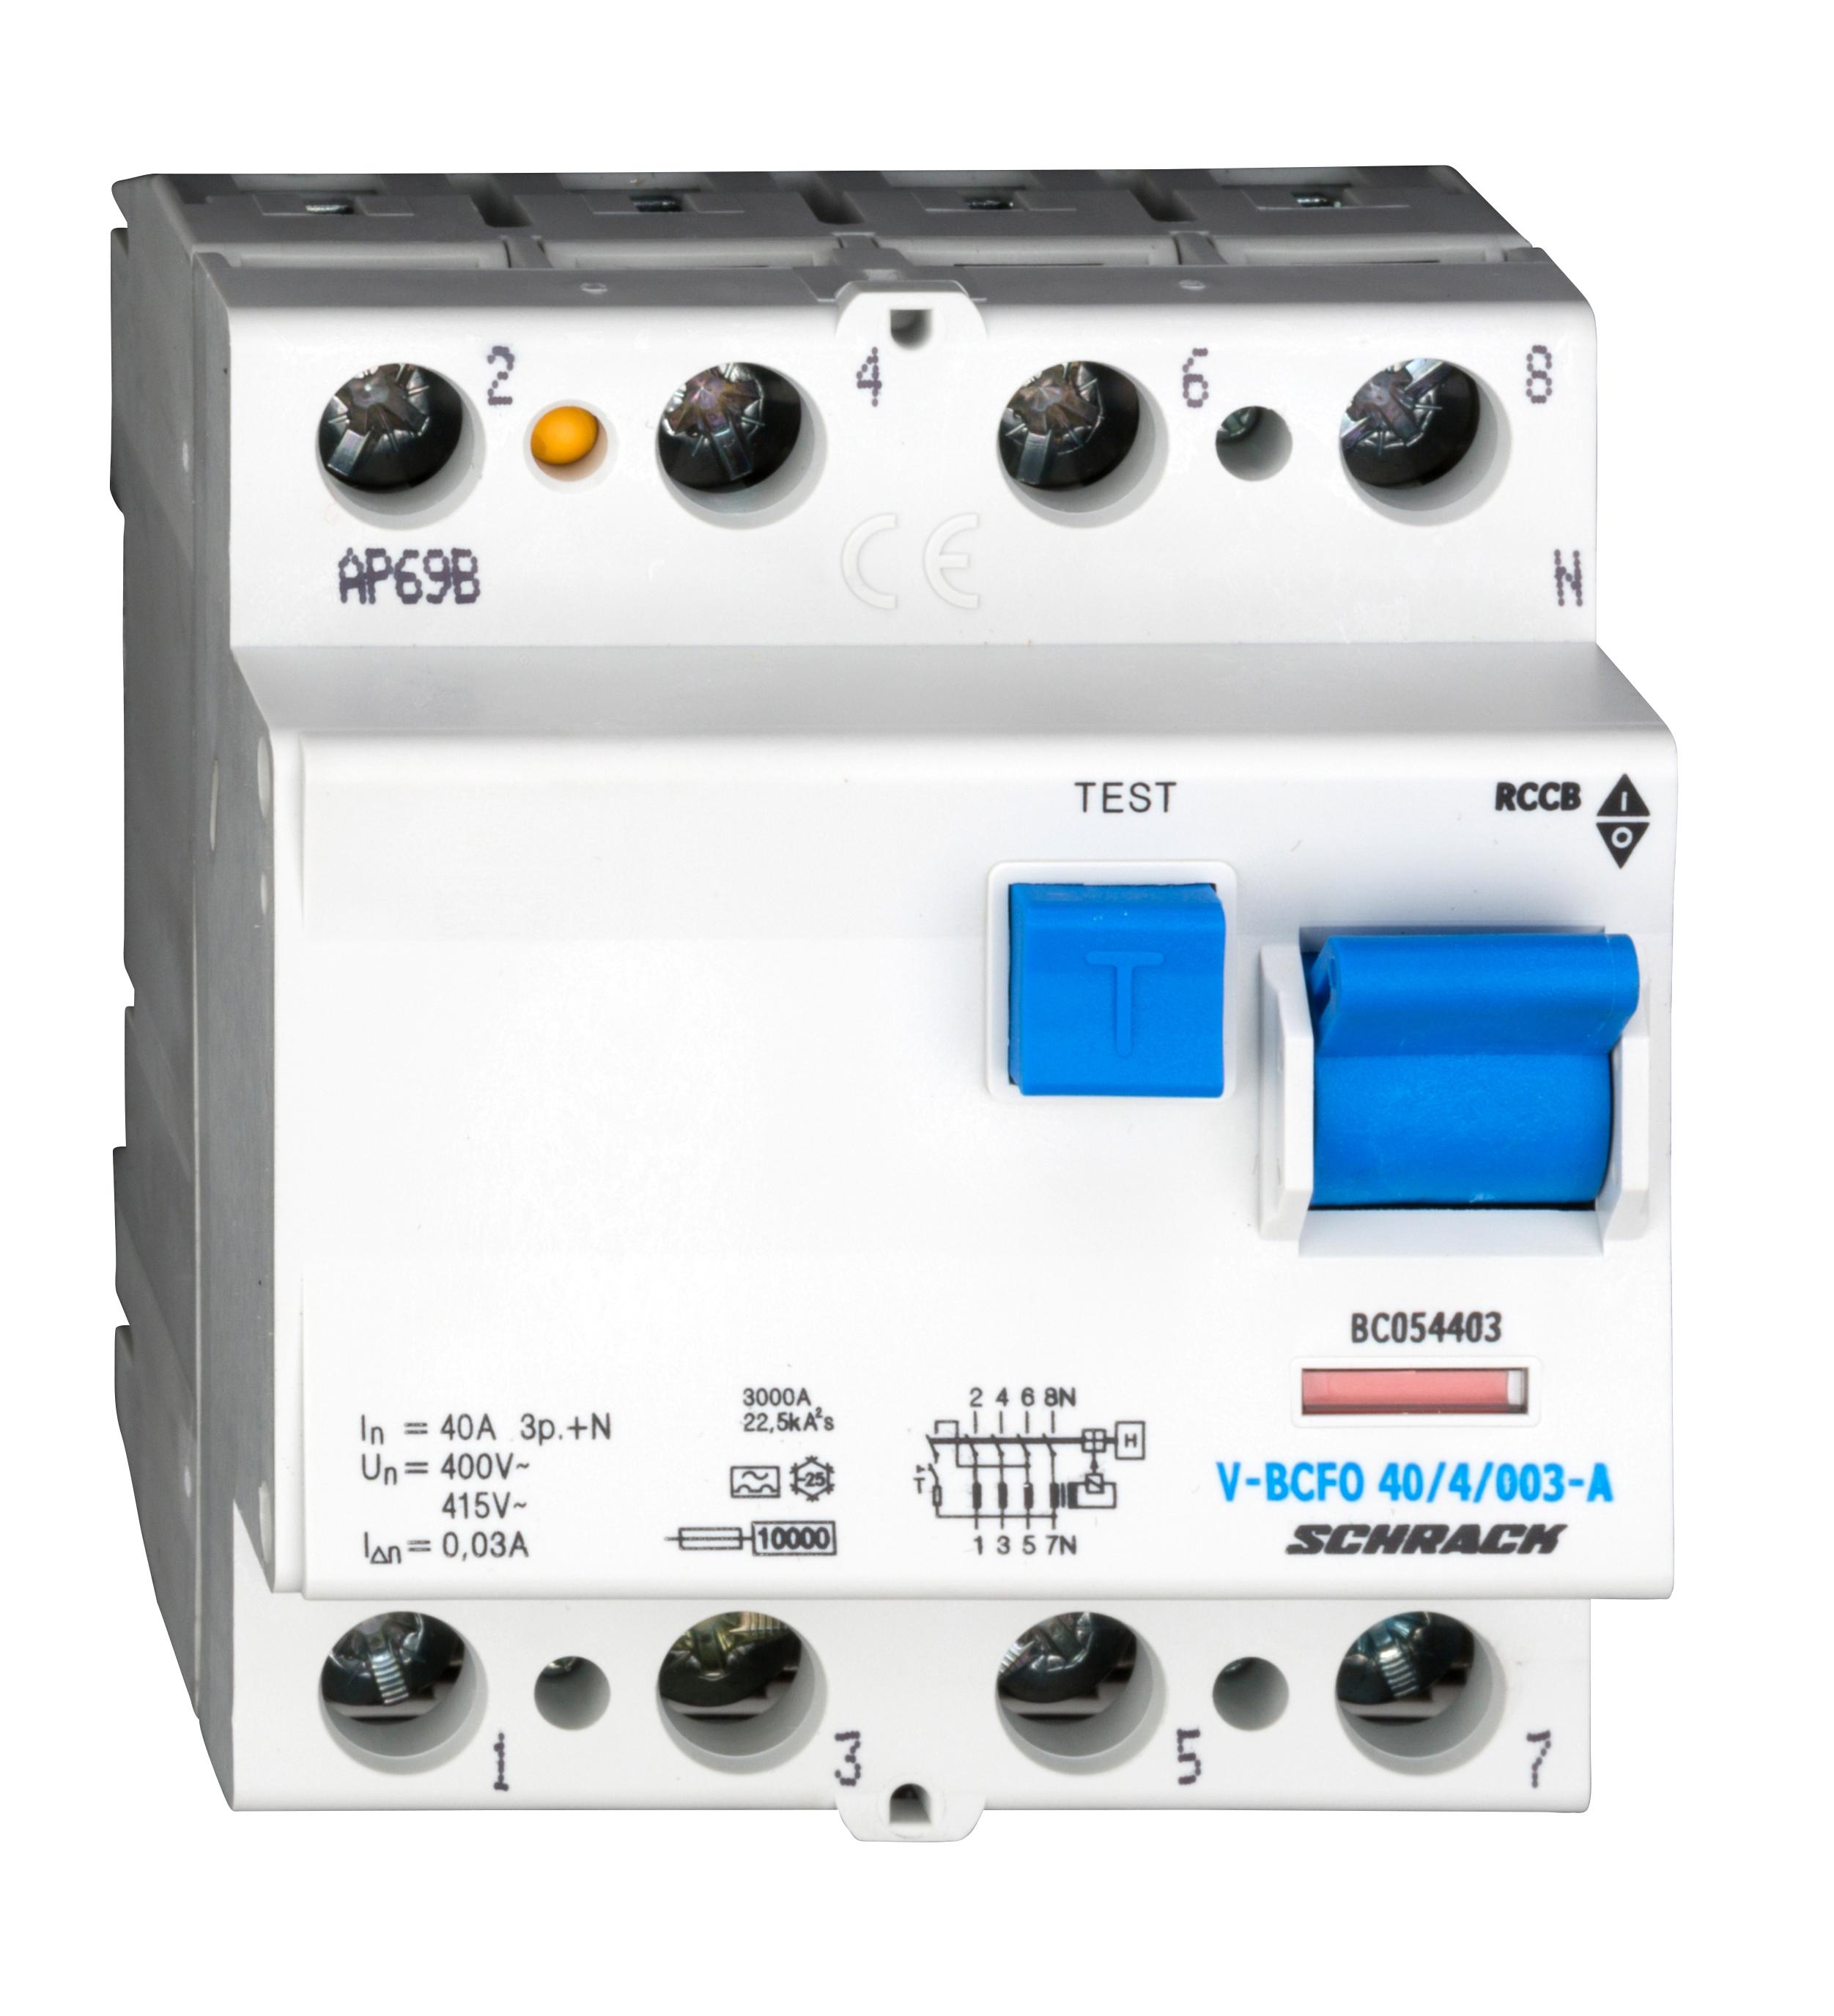 1 Stk FI-Schalter, 40A, 4-polig, 30mA, vsf., Typ A (Puls) BC054403--